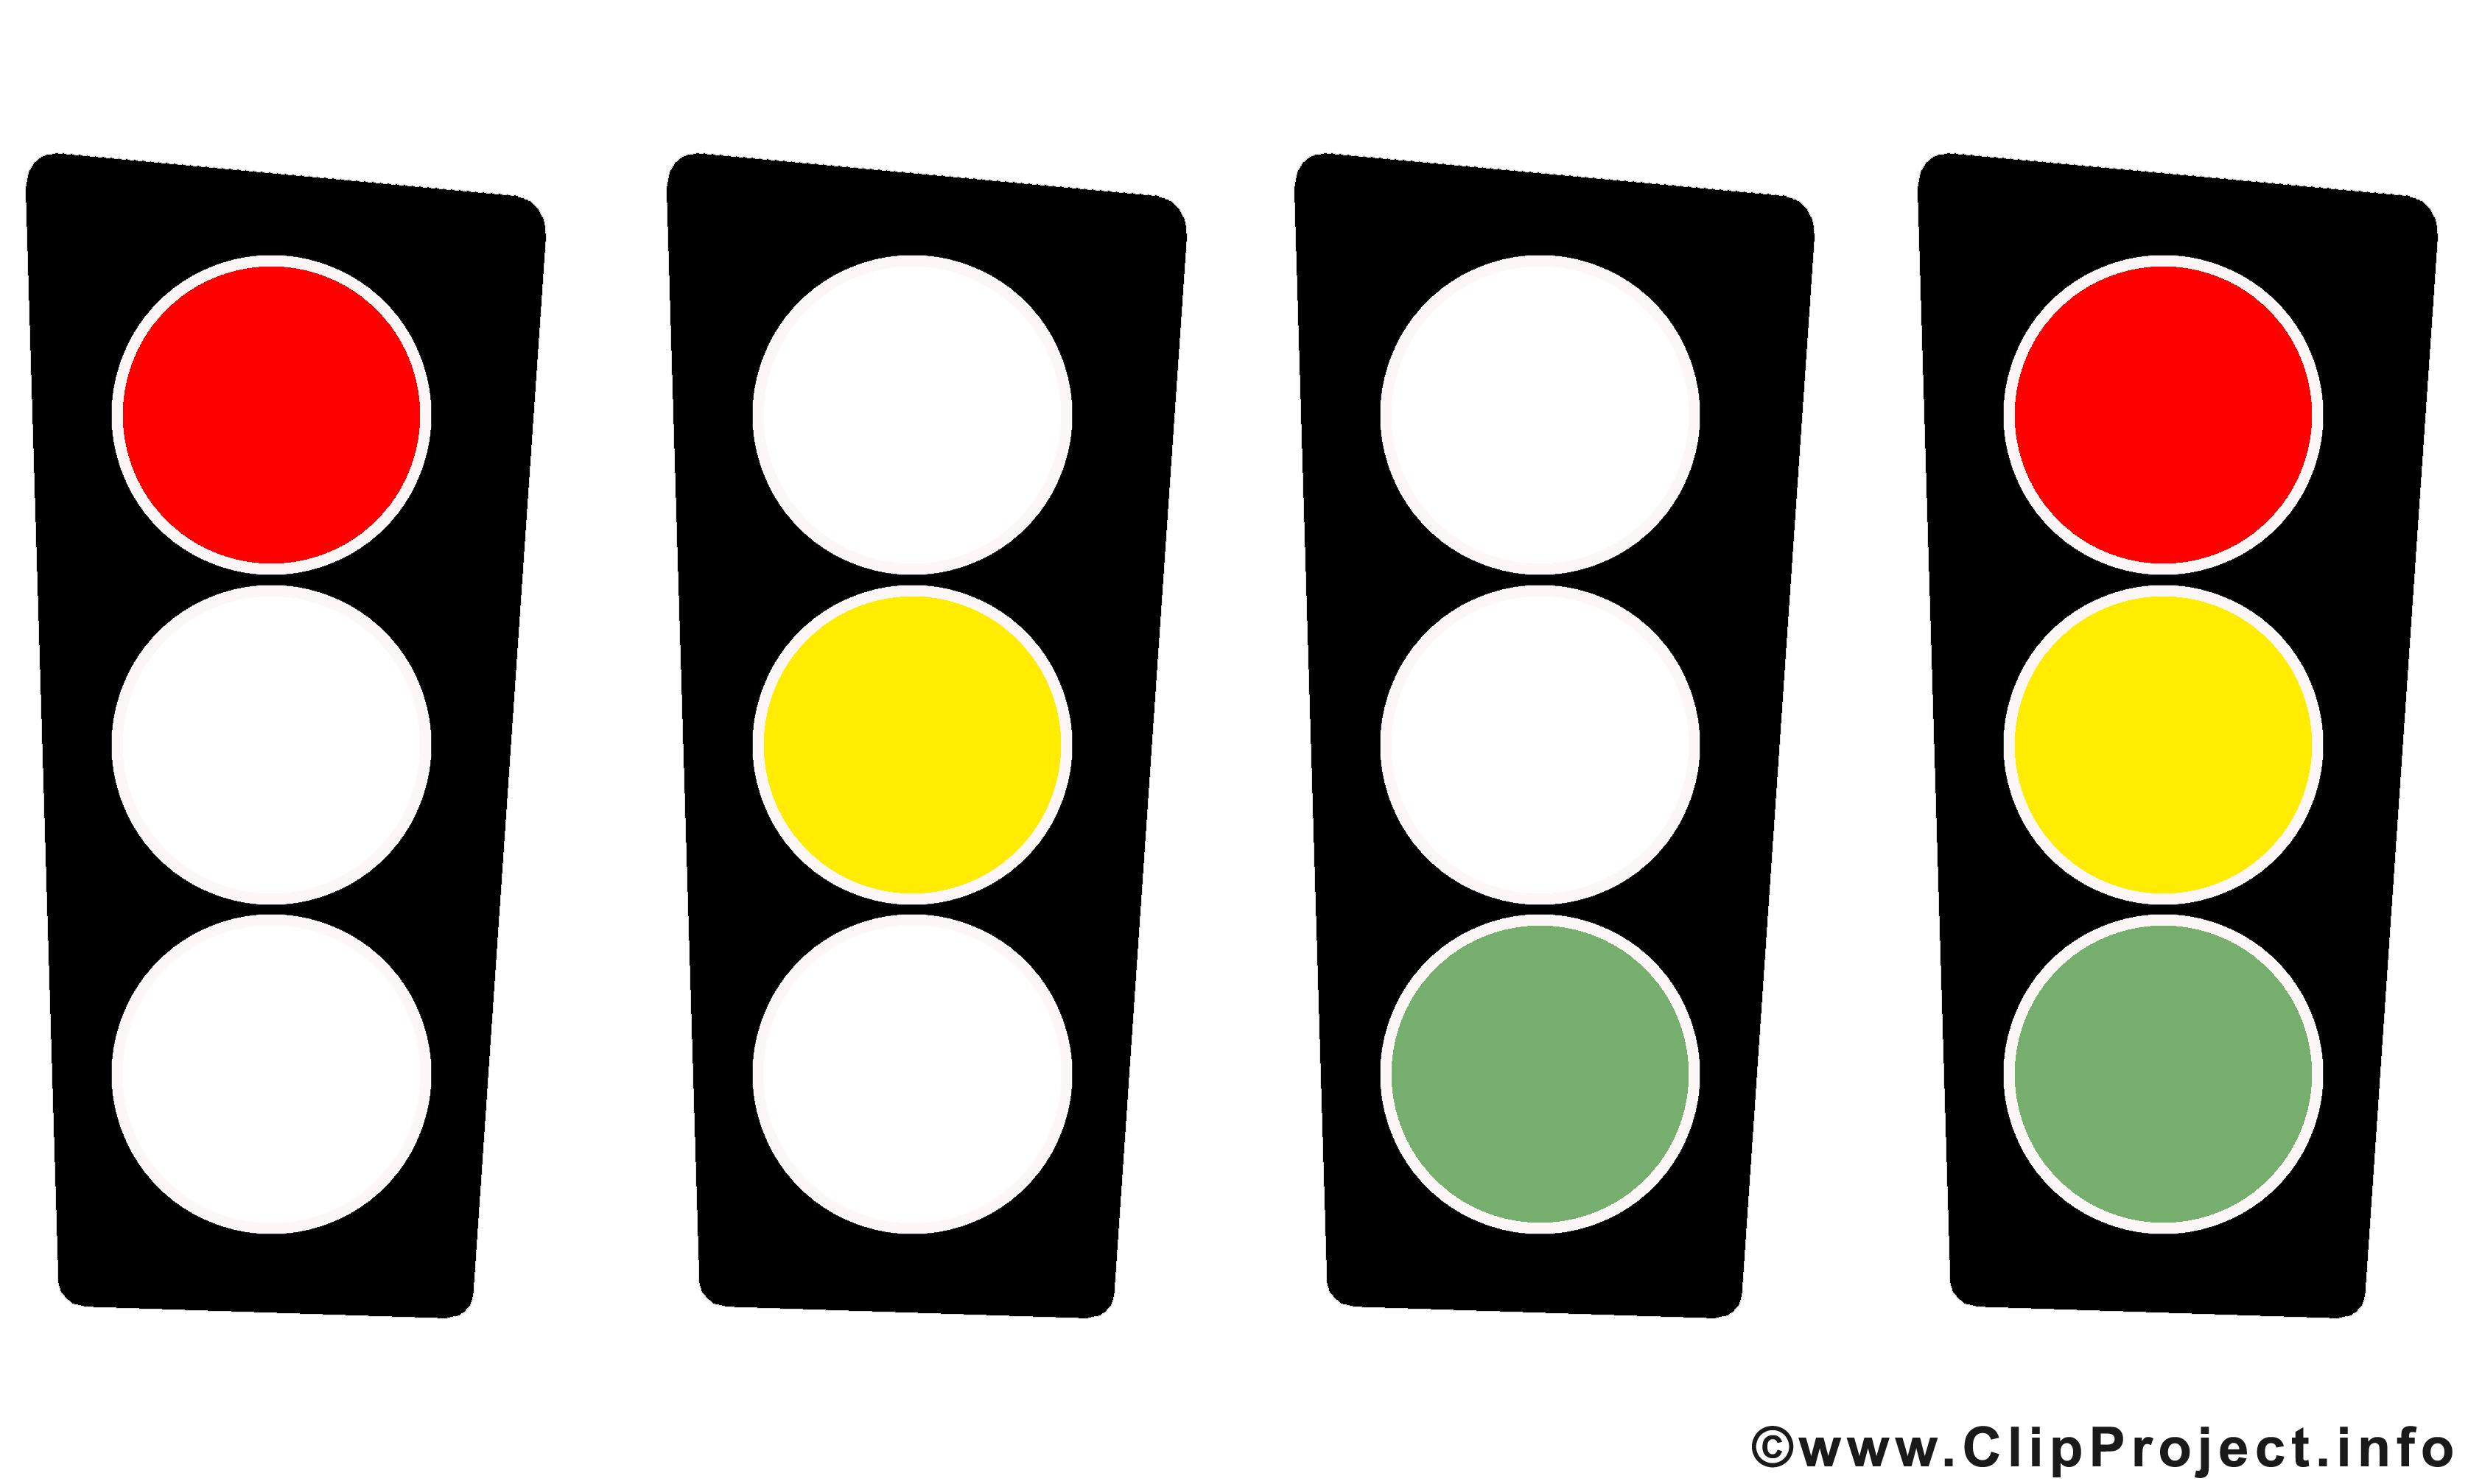 Feu tricolore bureau illustration gratuite bureau dessin for Bureau images gratuites